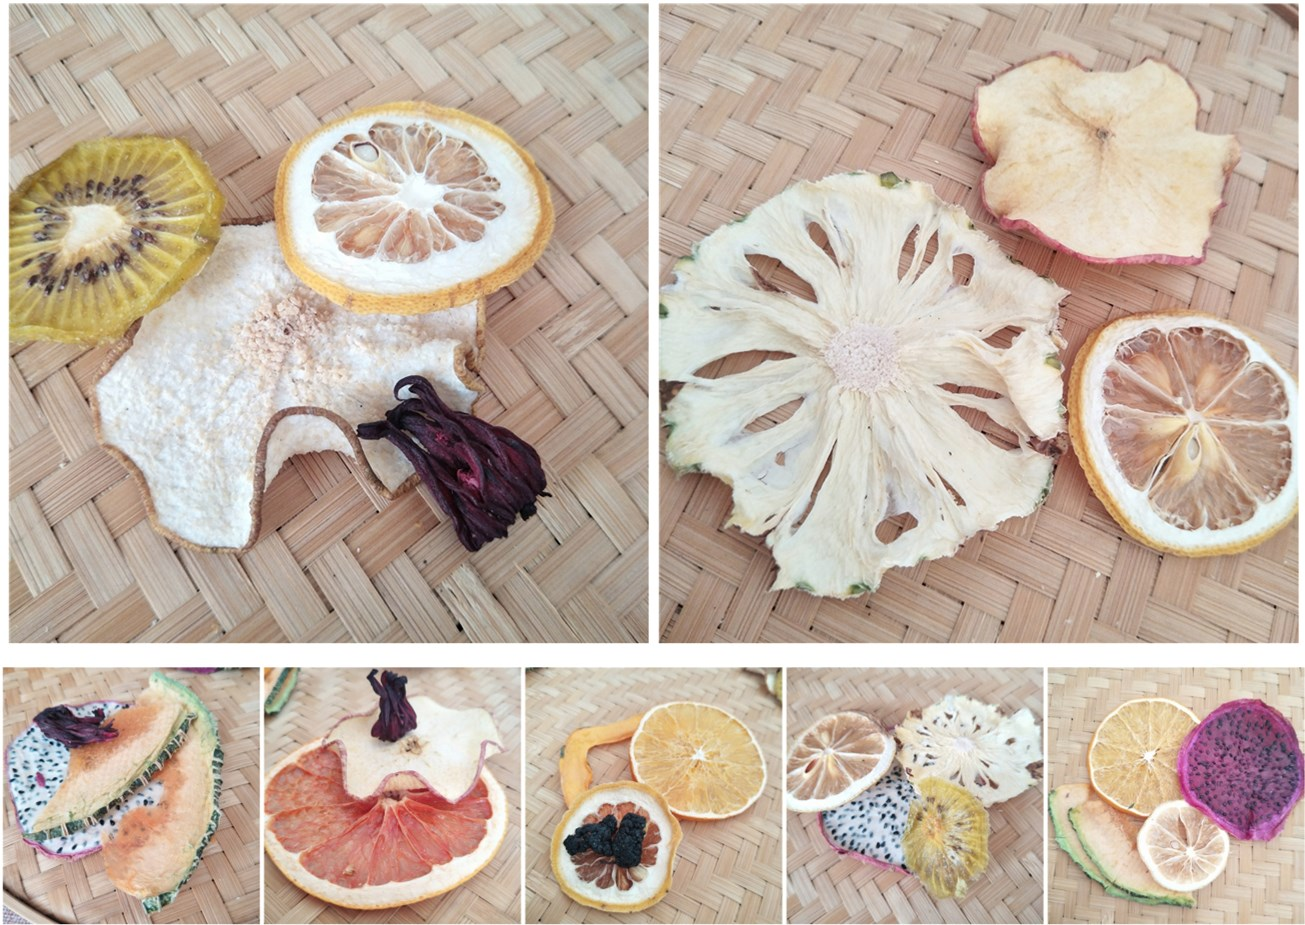 Individual Package chinese bulk certified halal detox tea dried fruit slice tea - 4uTea | 4uTea.com